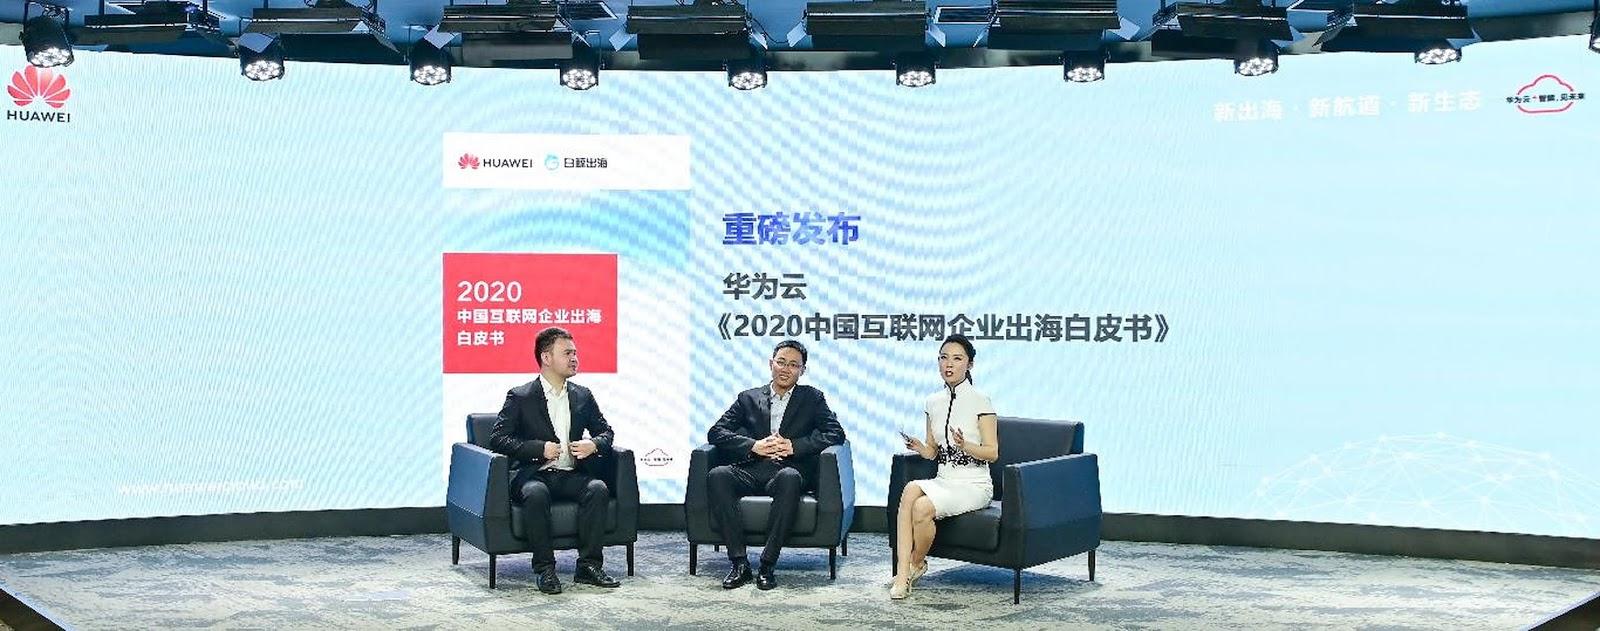 HUAWEI CLOUD ก้าวไกลระดับโลก สู่ผู้นำกลุ่มธุรกิจอินเทอร์เน็ตใน Asia Pacific พร้อมขยายครอบคลุมตลาดทั่วโลก